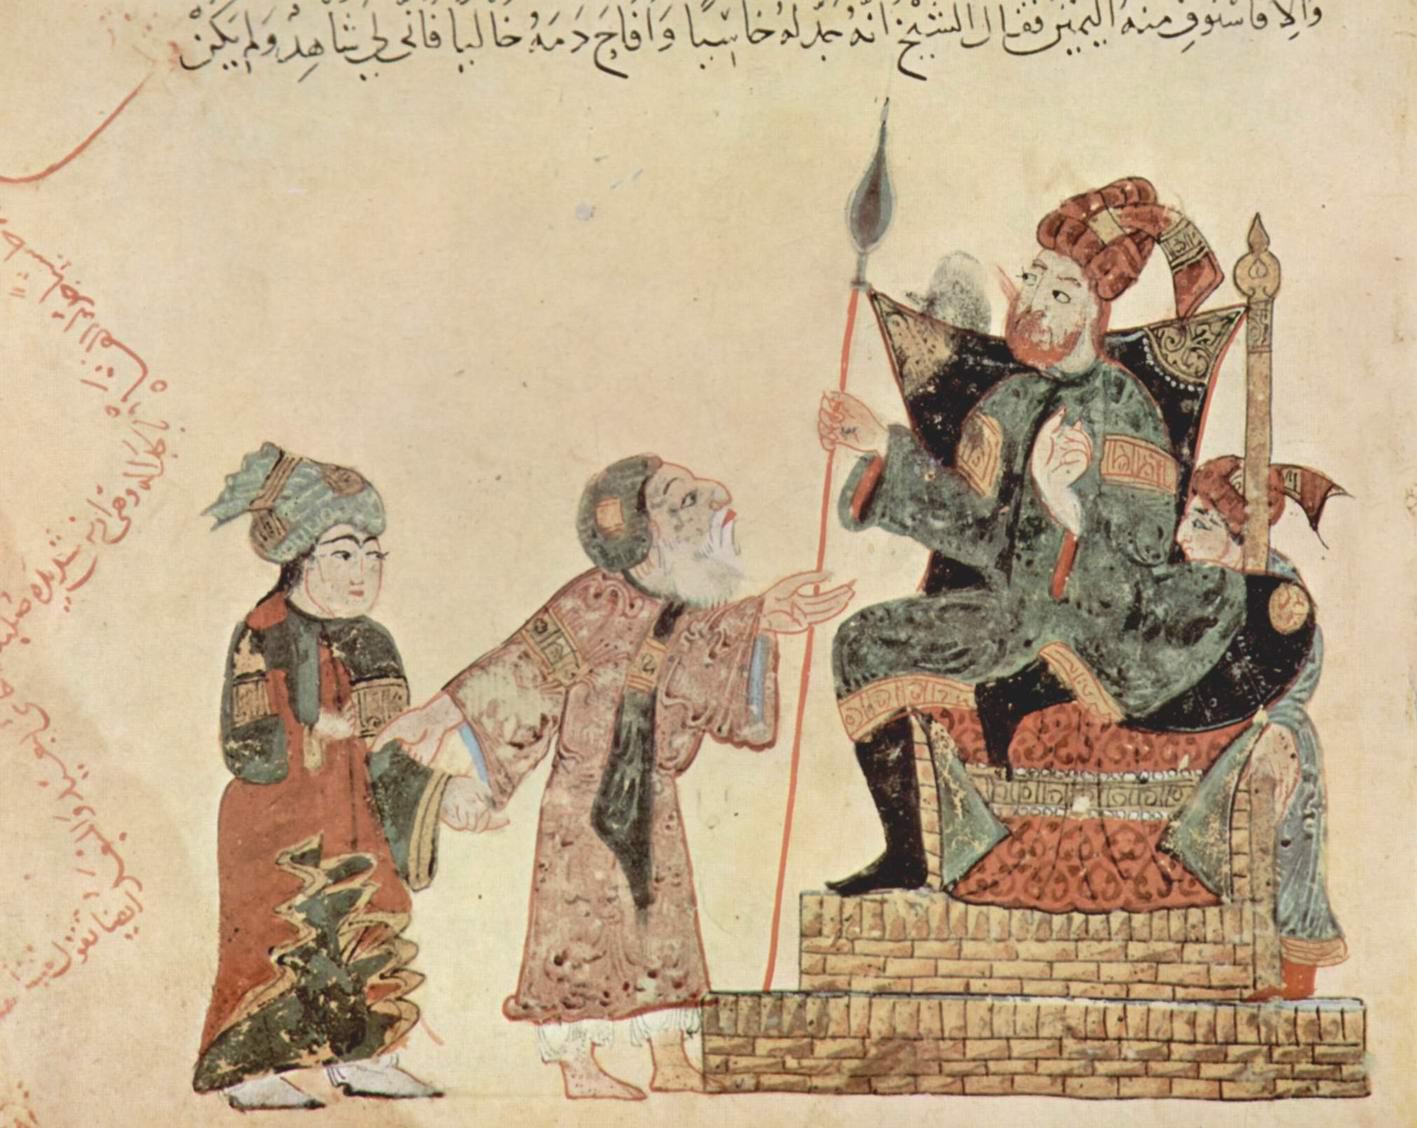 Харири, Абу Саид перед наместником Рахбой (десятый макам), Аль-Васити Яхья ибн-Махмуд